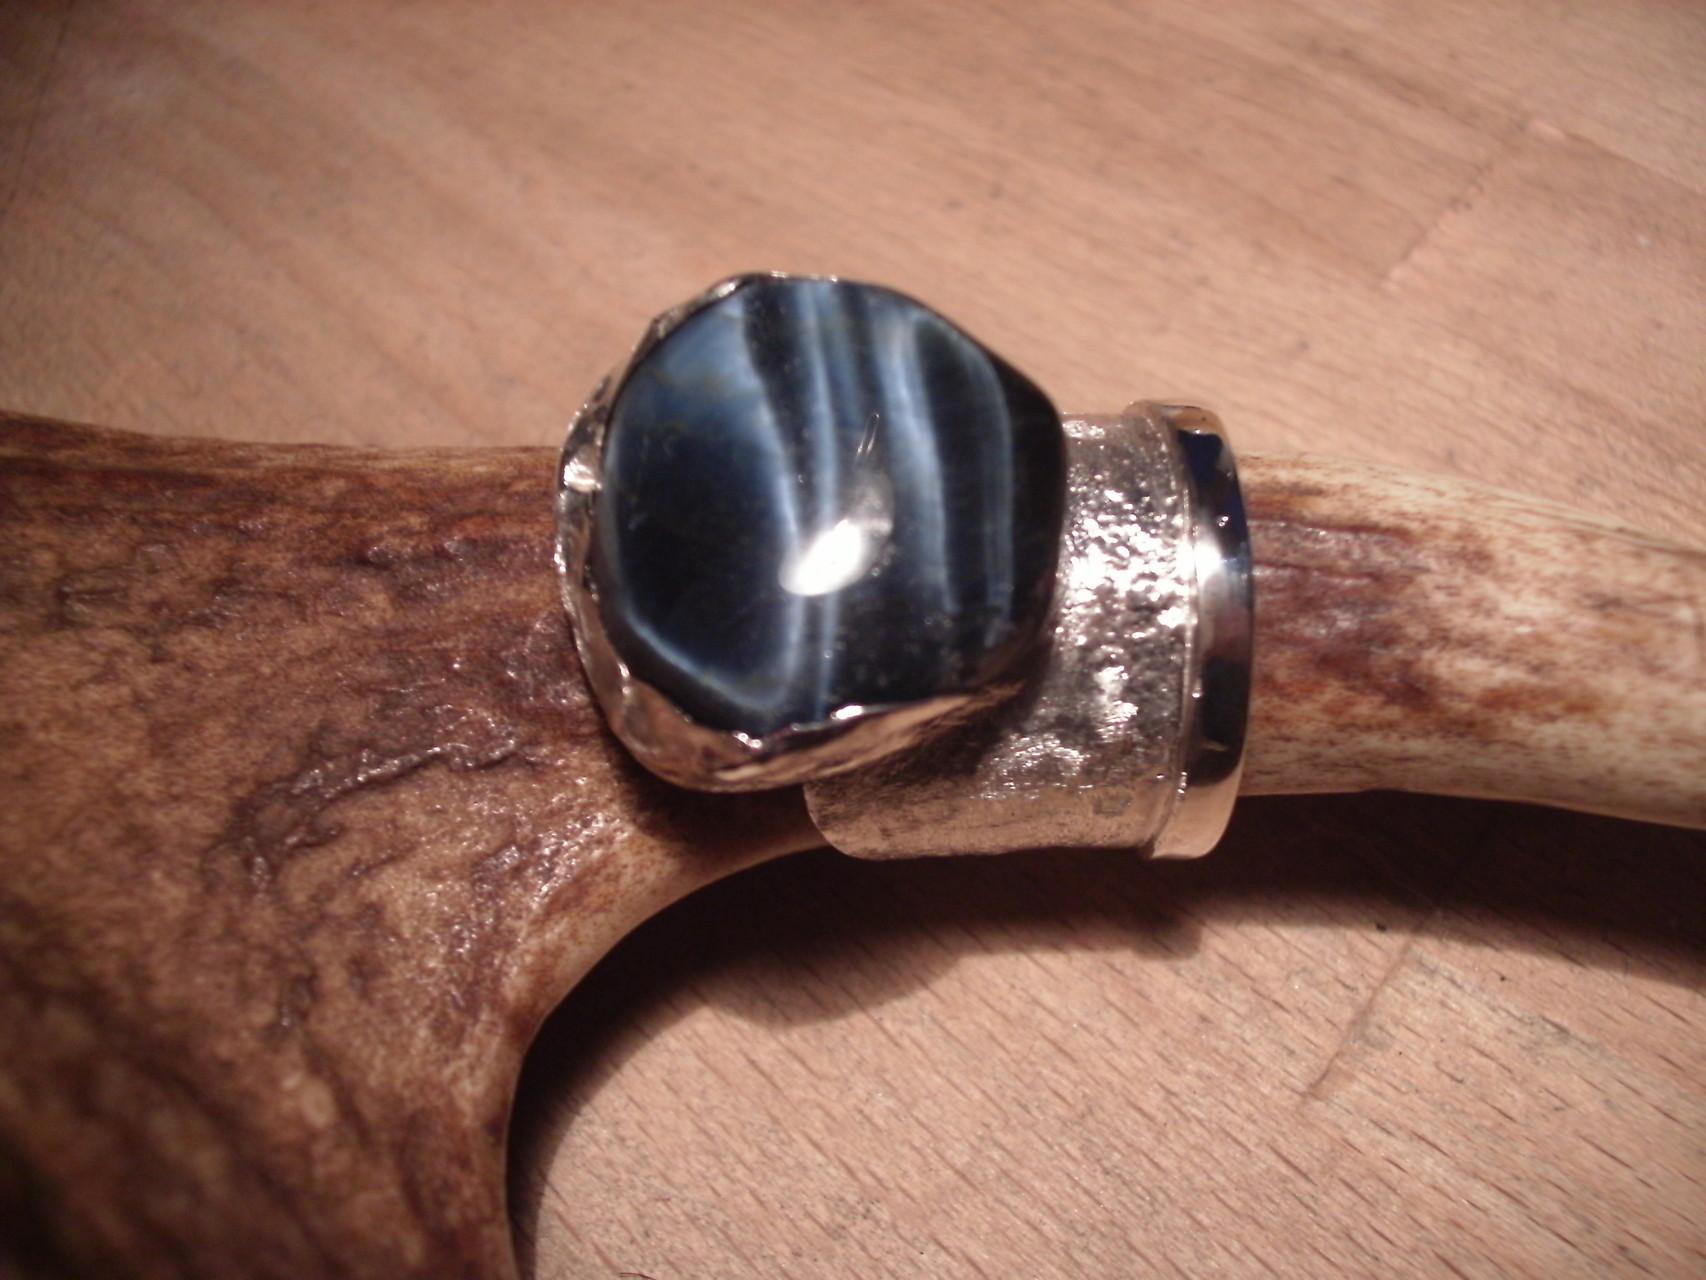 Silberring mit blau-strahlendem Achat (925 Sterlingsilber) Preis: CHF 280.-